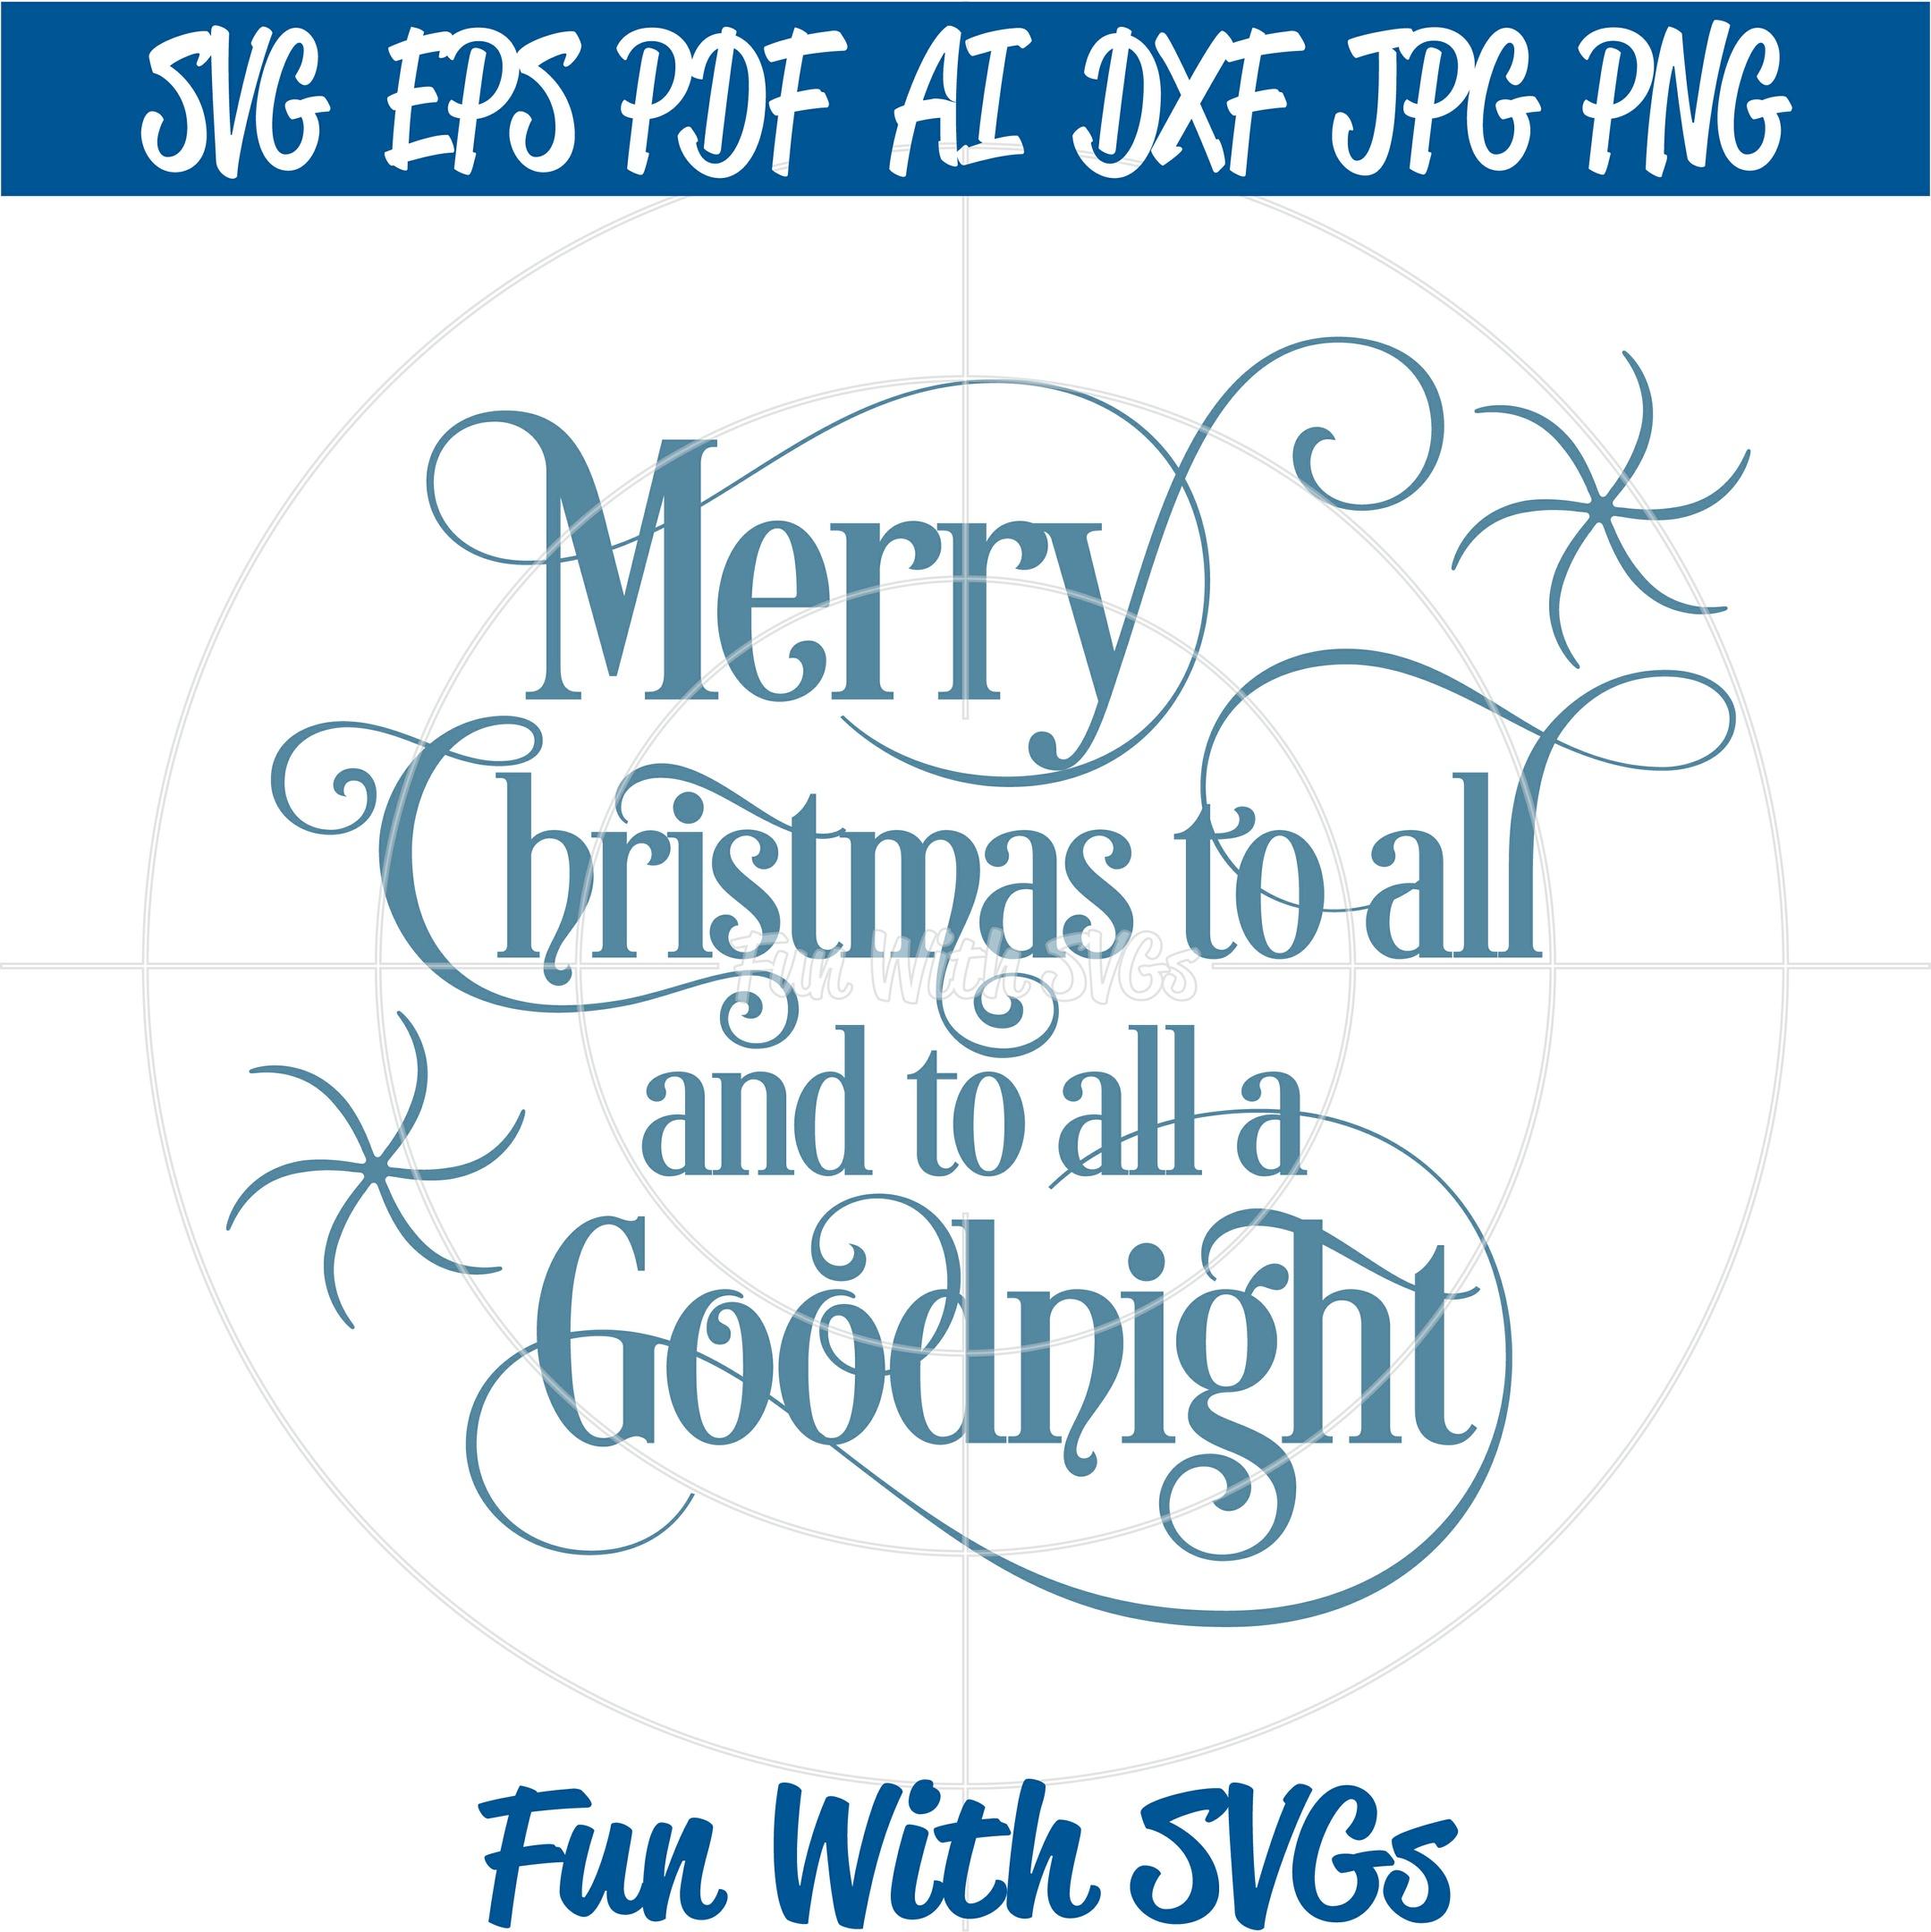 Merry Christmas to All and to All a Good Night, SVG File, Printable Graphics